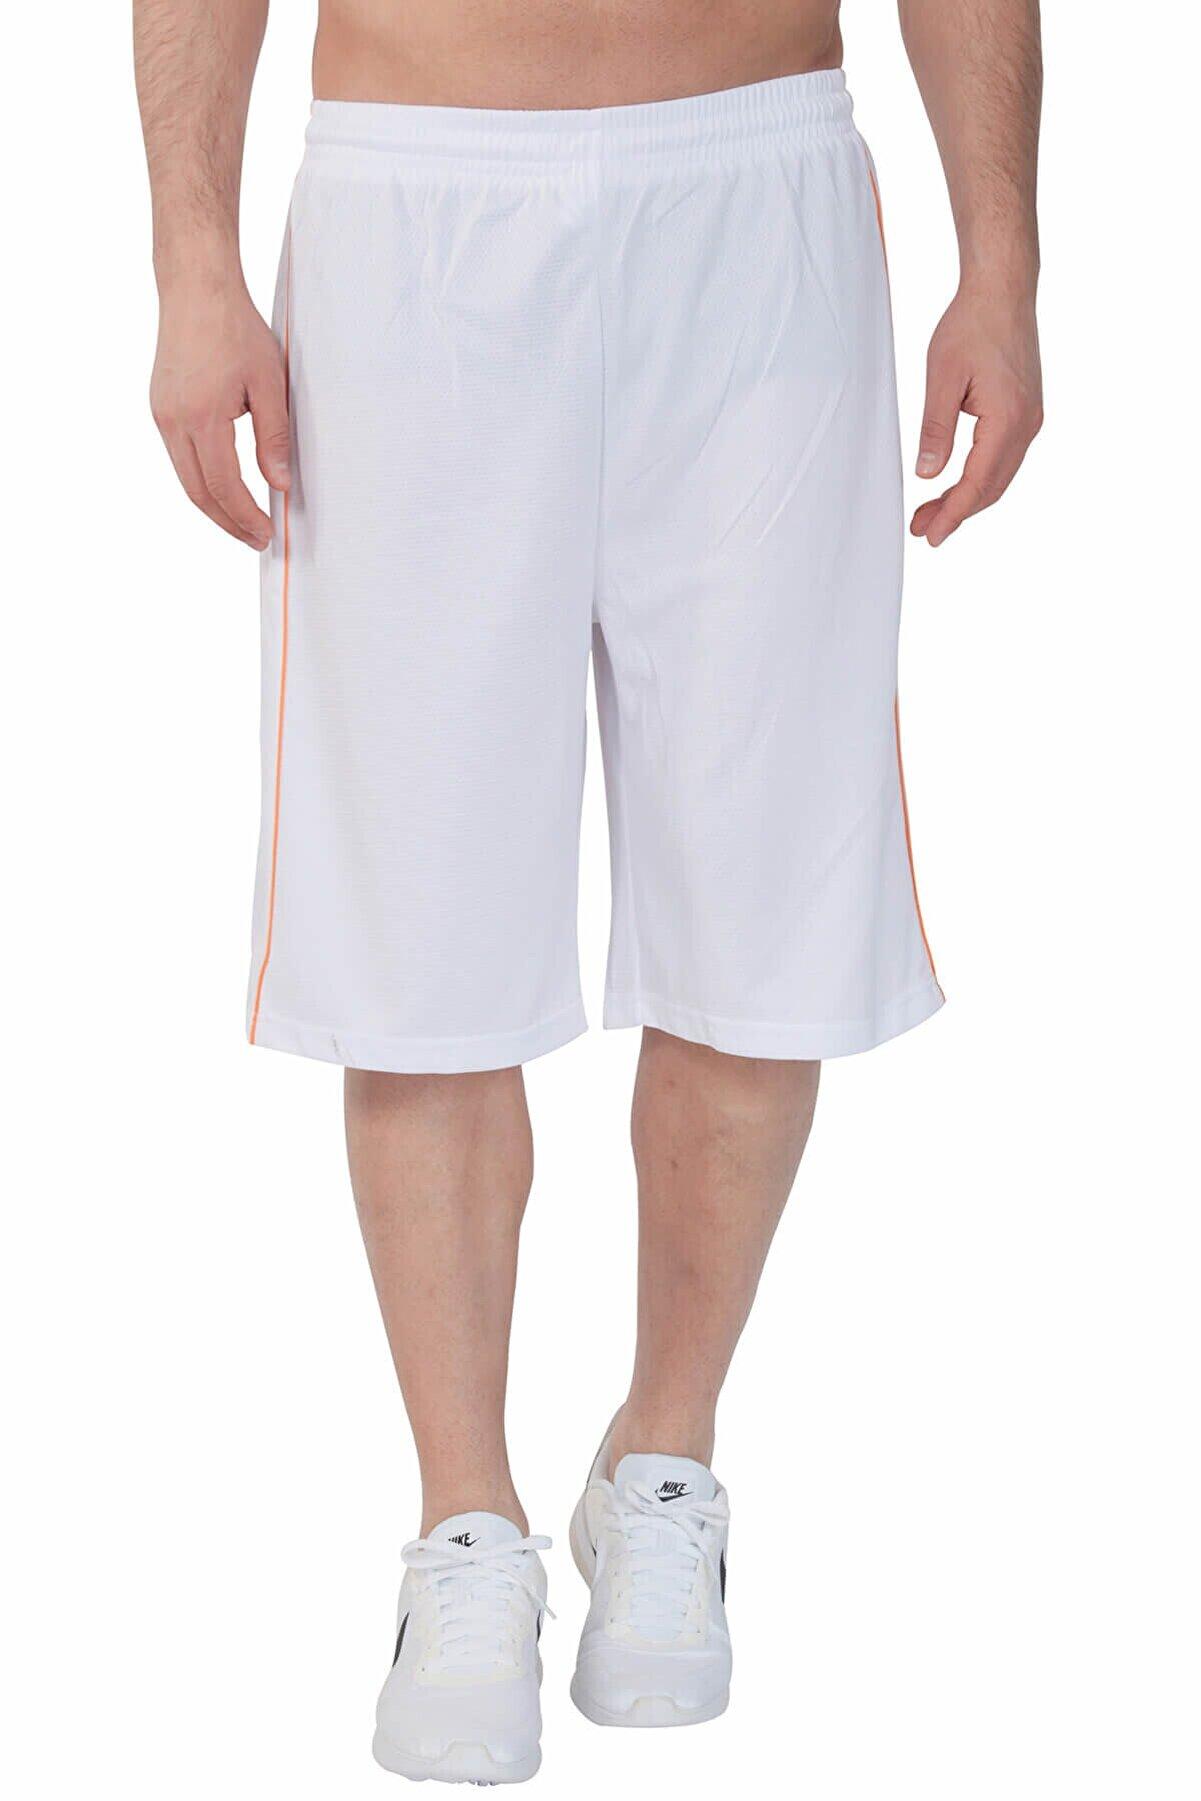 Sportive Tiger Erkek Beyaz Basketbol Şortu 500075-0bt